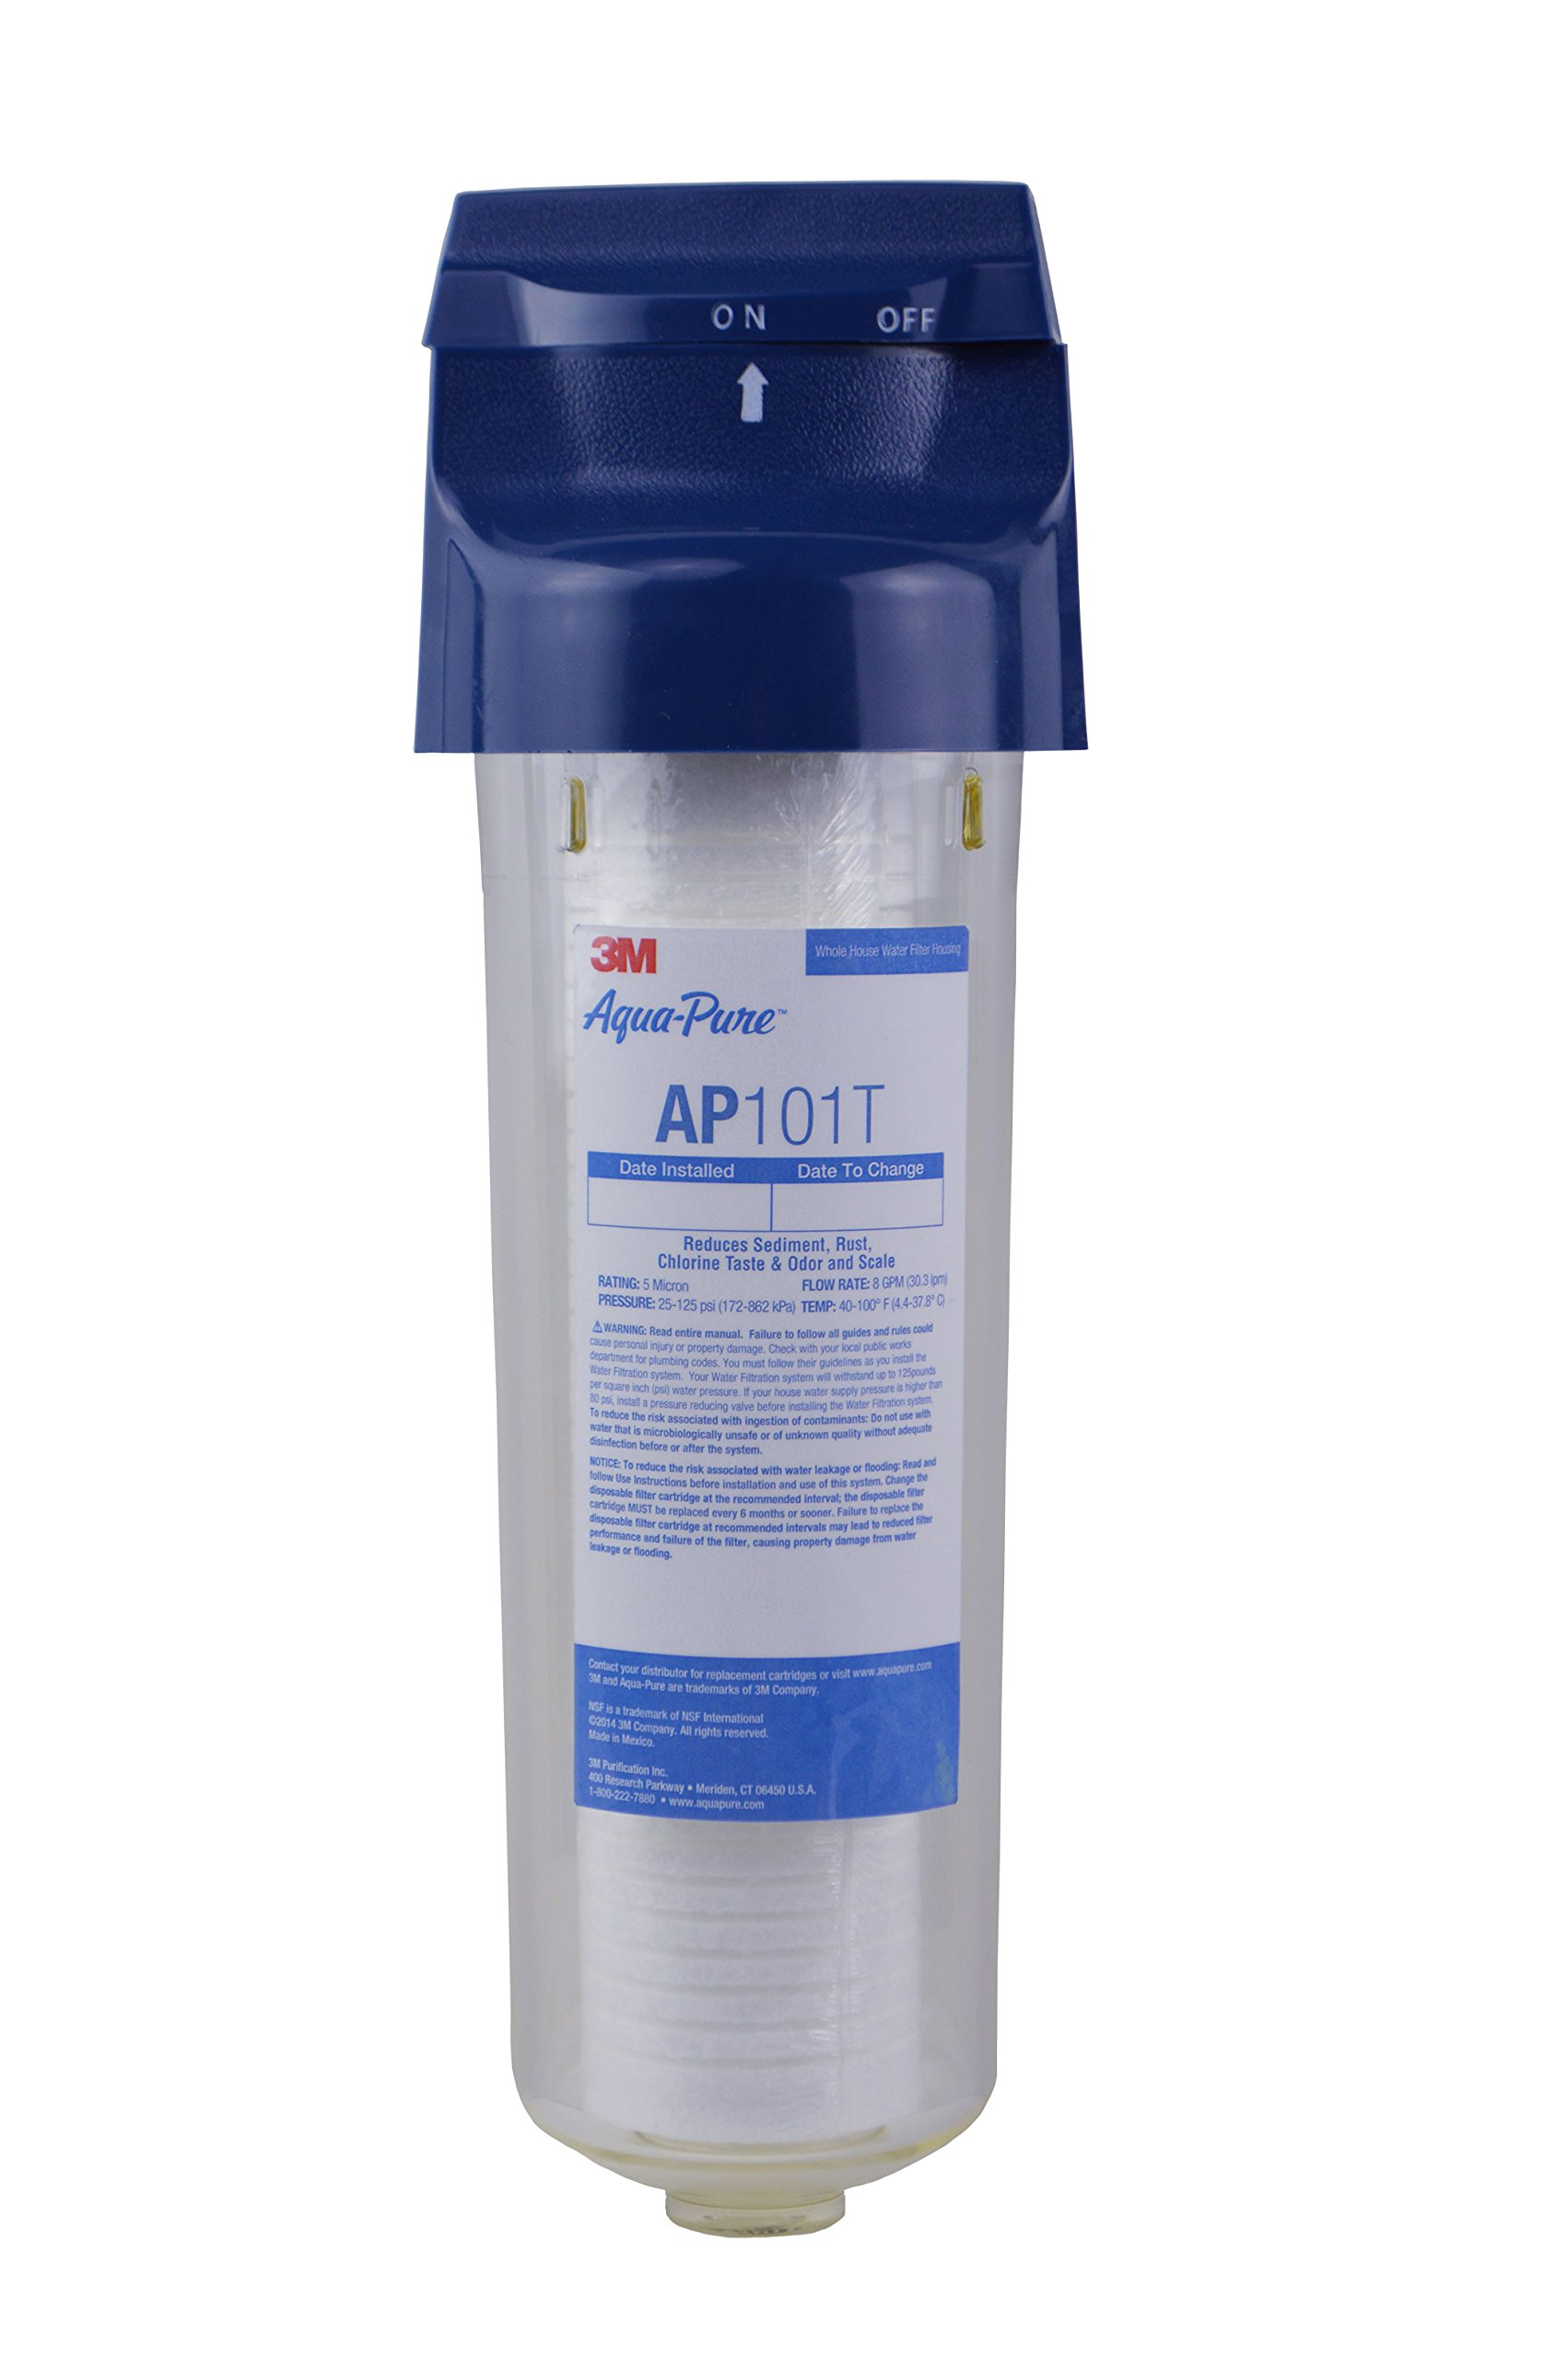 Aqua-Pure AP101T Whole House Transparent Water Filter by 3M Aqua-Pure